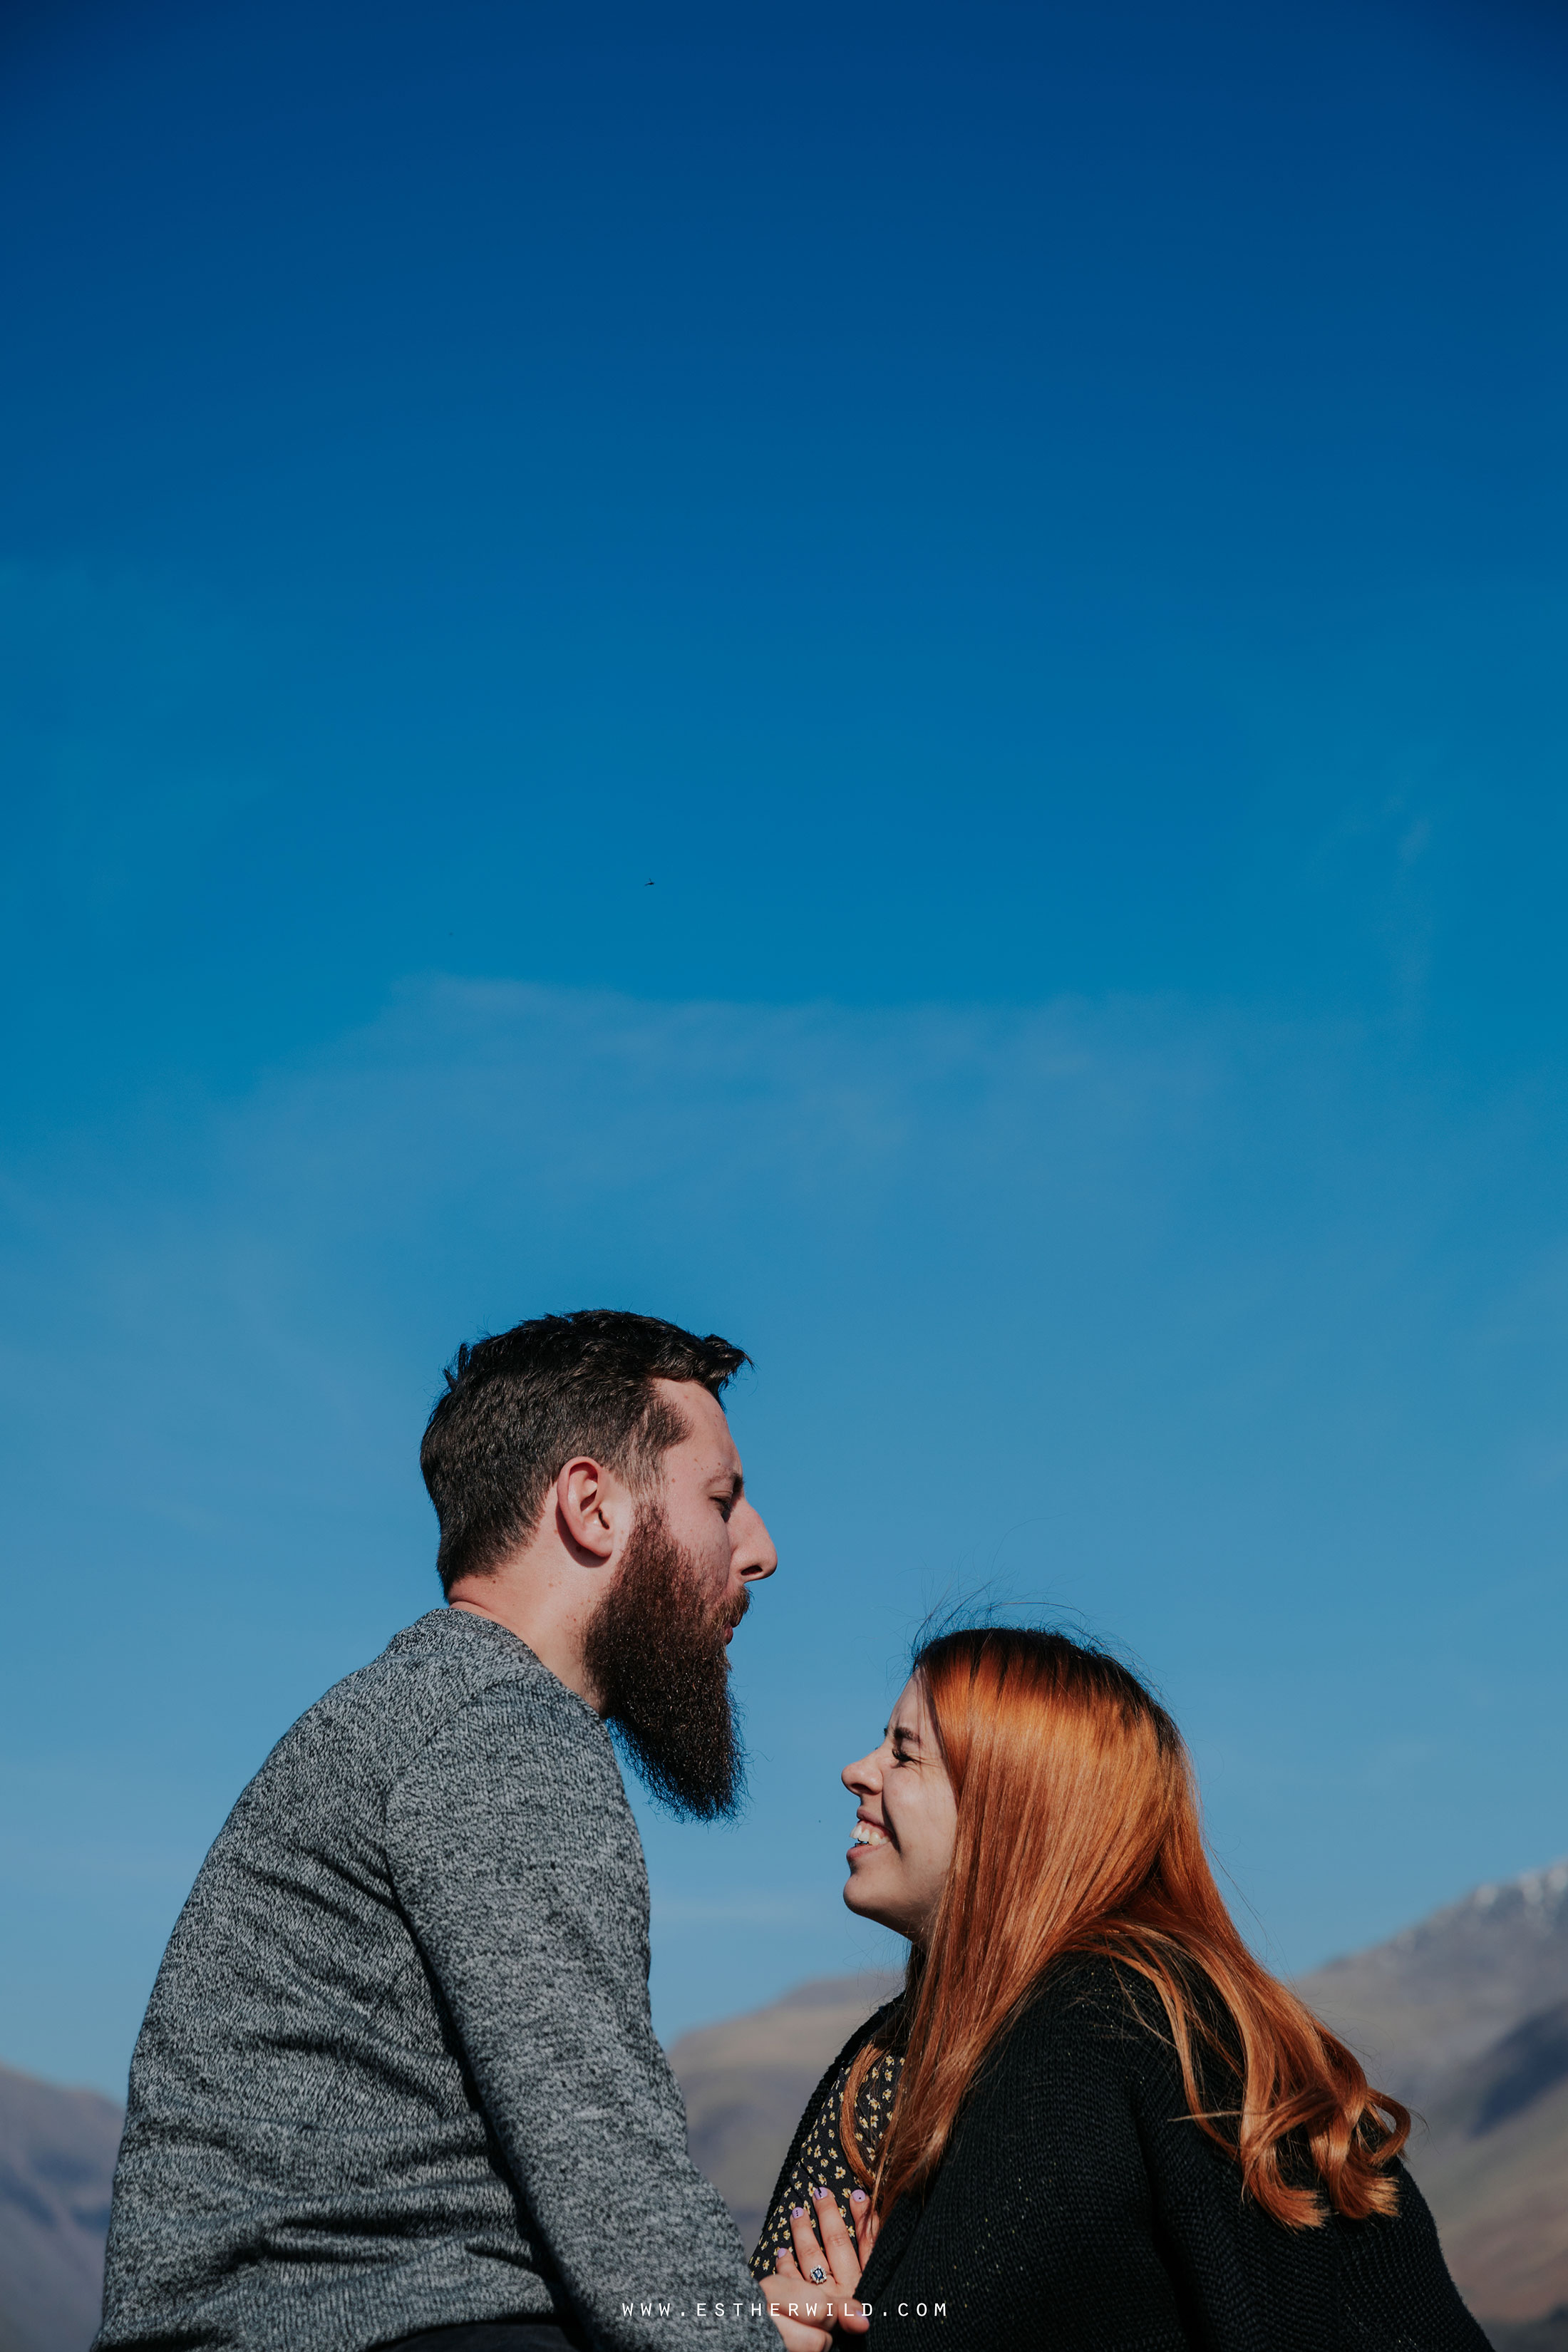 Cumbria_Lake_District_Wasdale_Wedding_Photographer_Destination_Engagement_Anniversary_Esther_Wild_IMG_3395.jpg